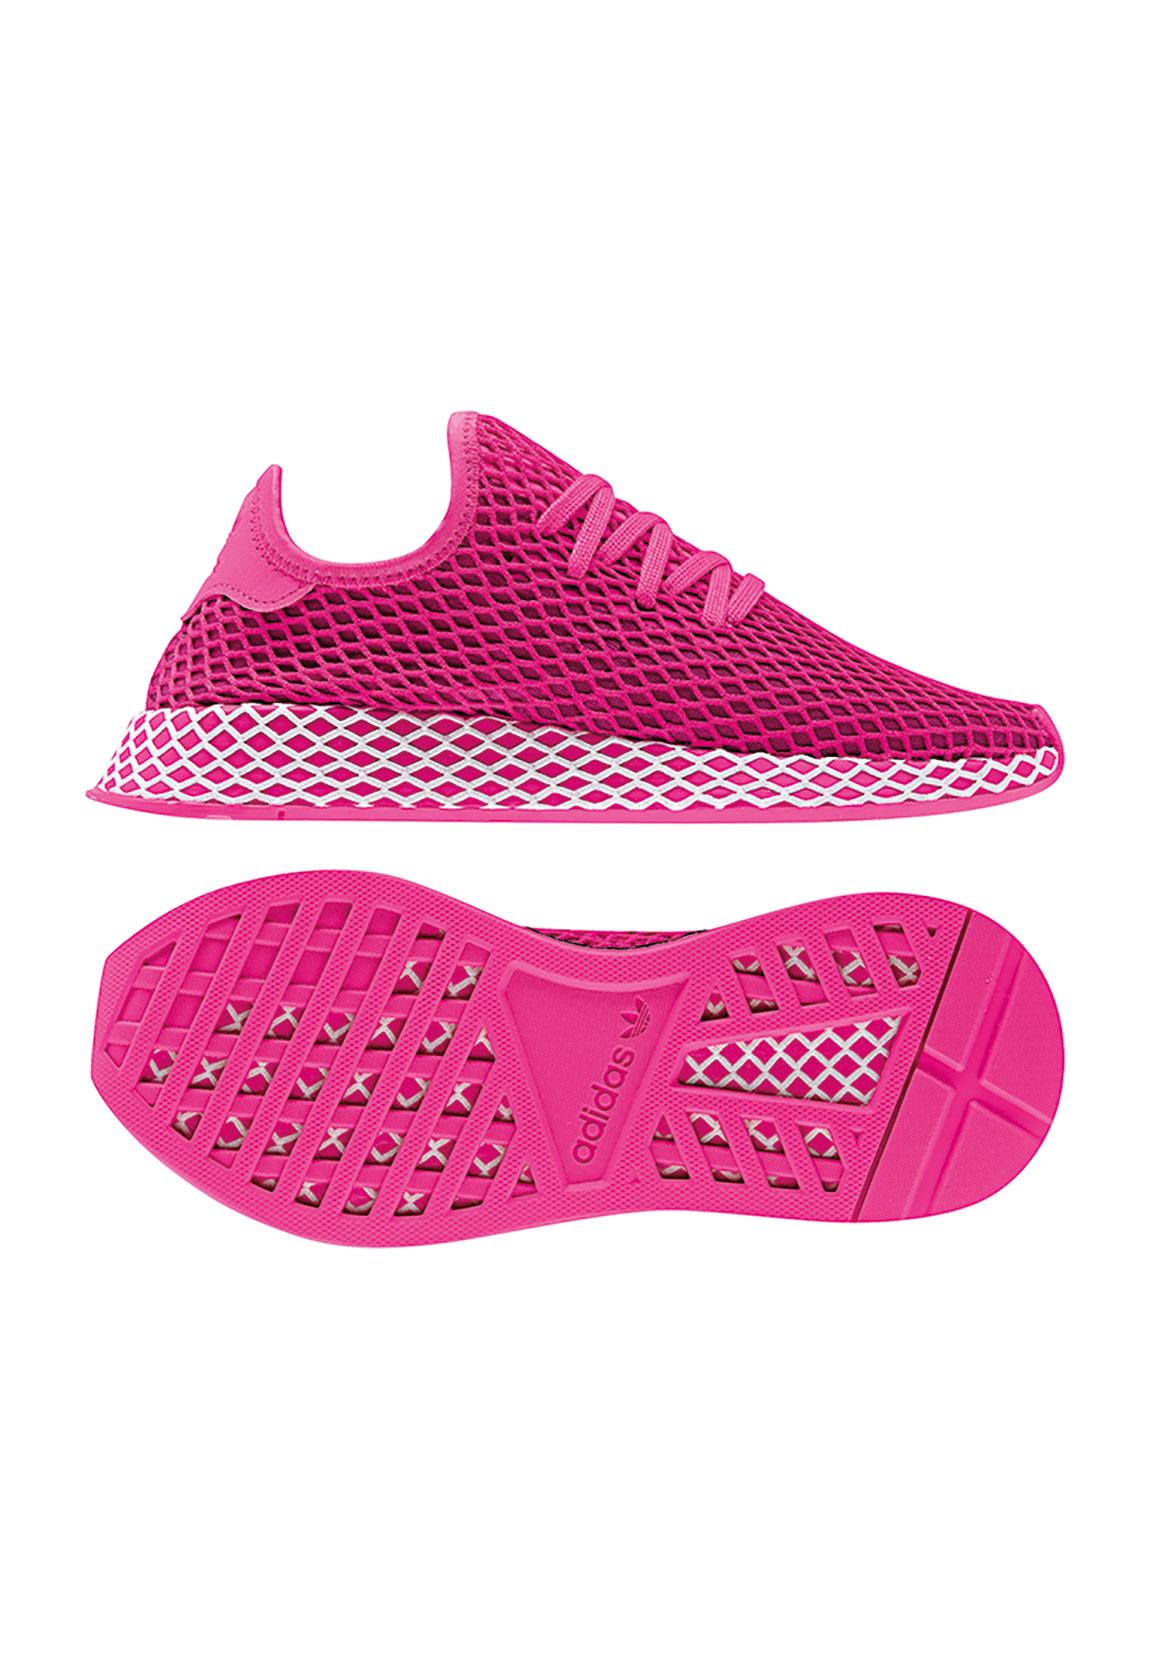 san francisco 6a617 06eb0 Manufacturer  Adidas Originals